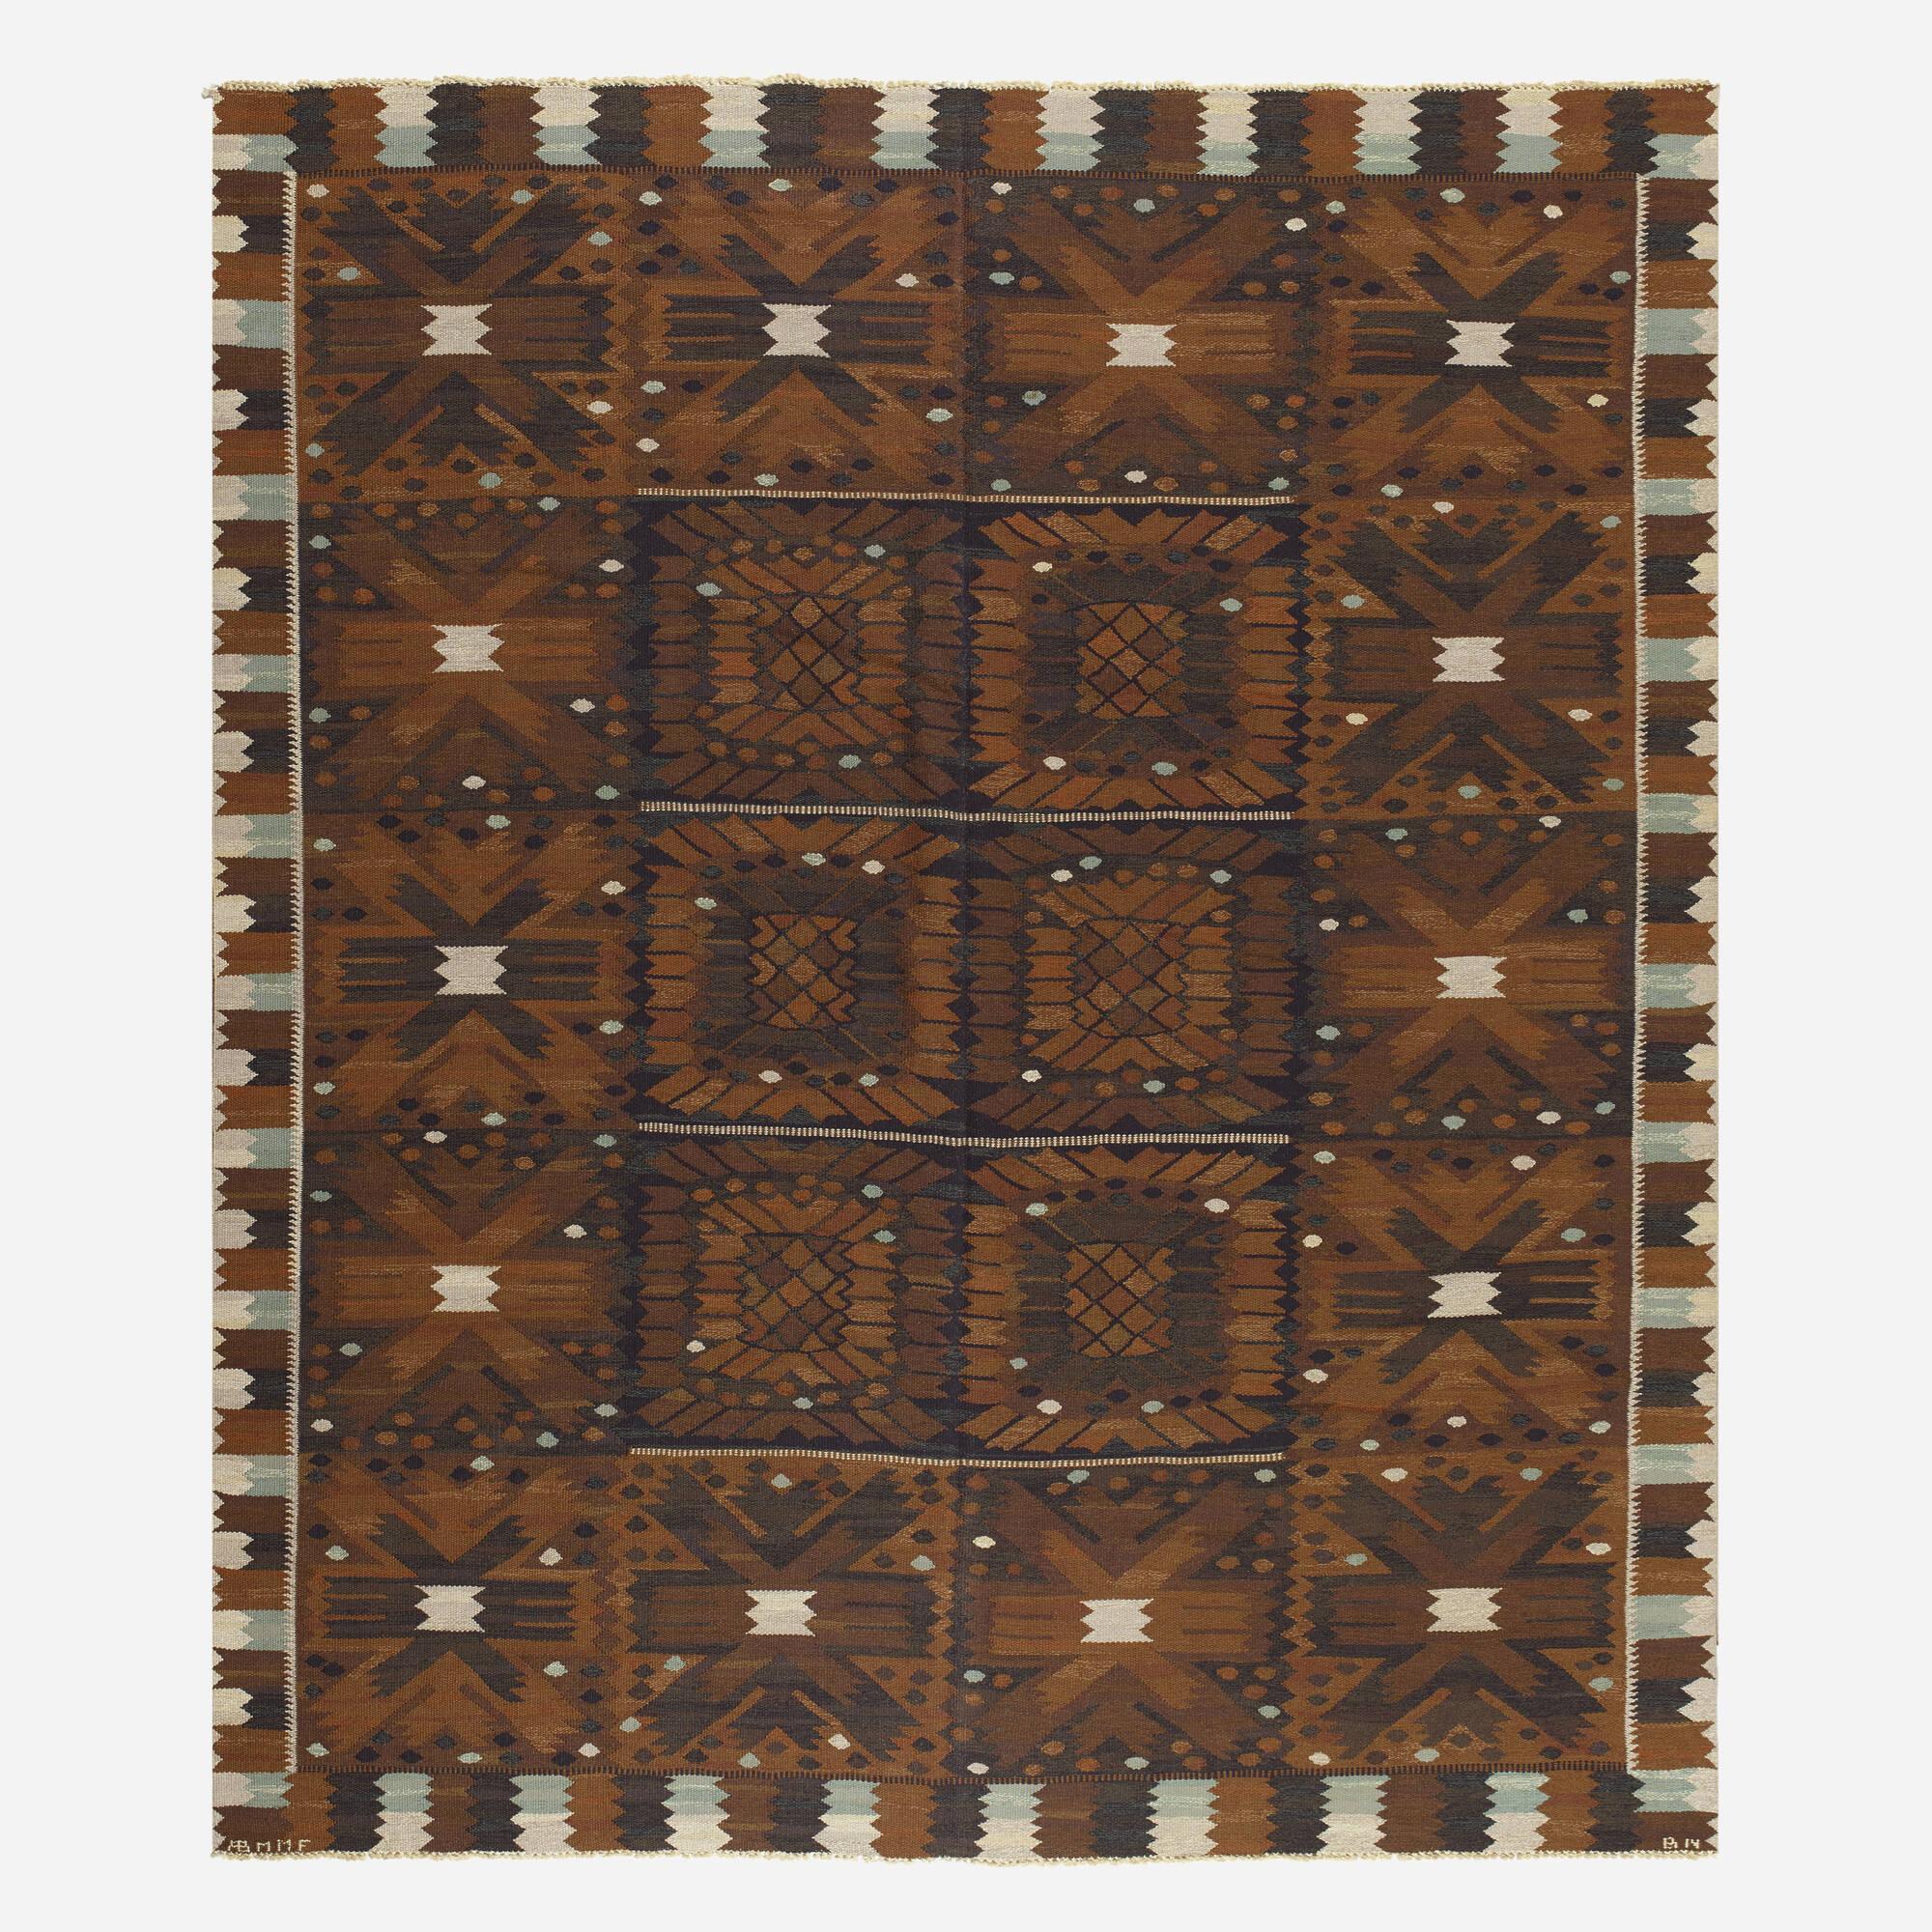 147: Barbro Nilsson / Carnation tapestry weave carpet (1 of 2)